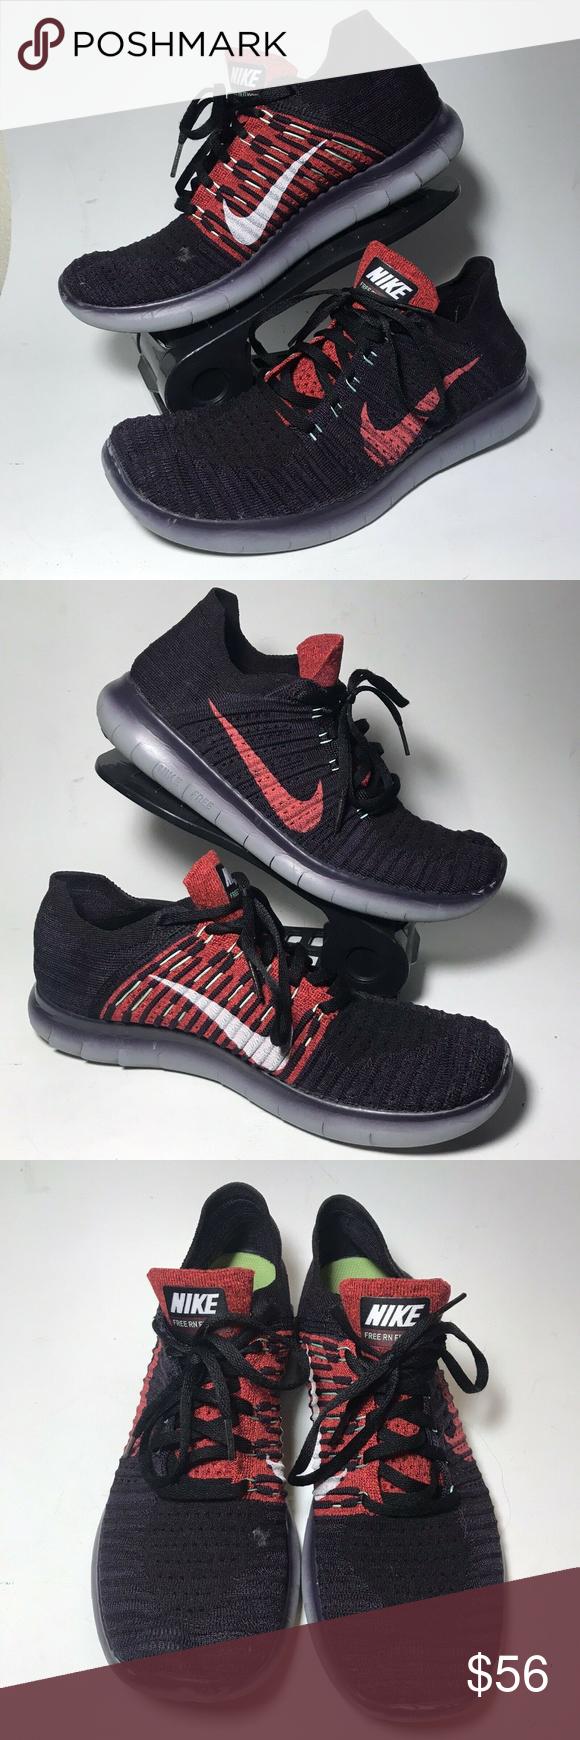 pasado dormitar Muelle del puente  Nike Natural Flexible Flex Fit Breathable Men 11 | Shoe department, Nike,  Black nikes